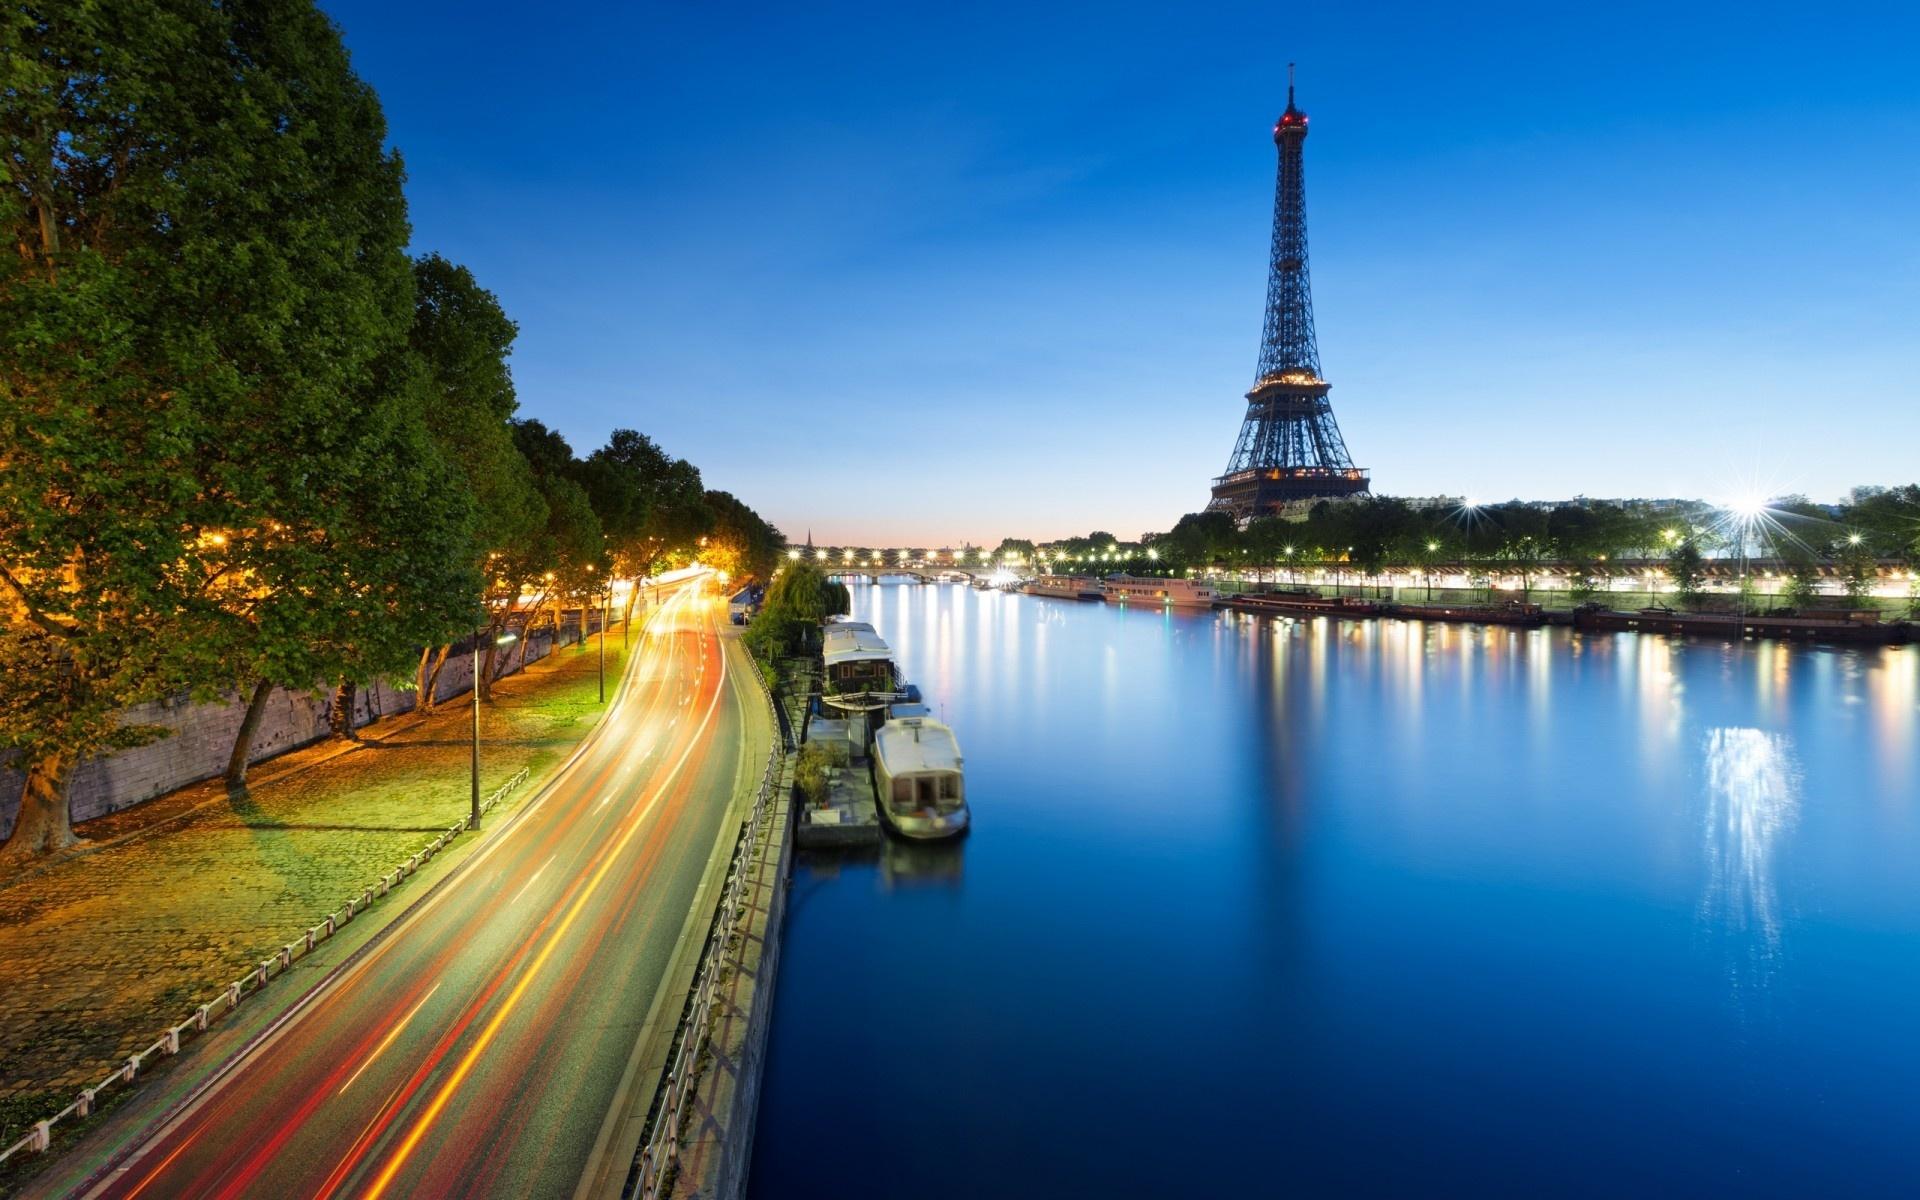 La Torre Eiffel - 1920x1200